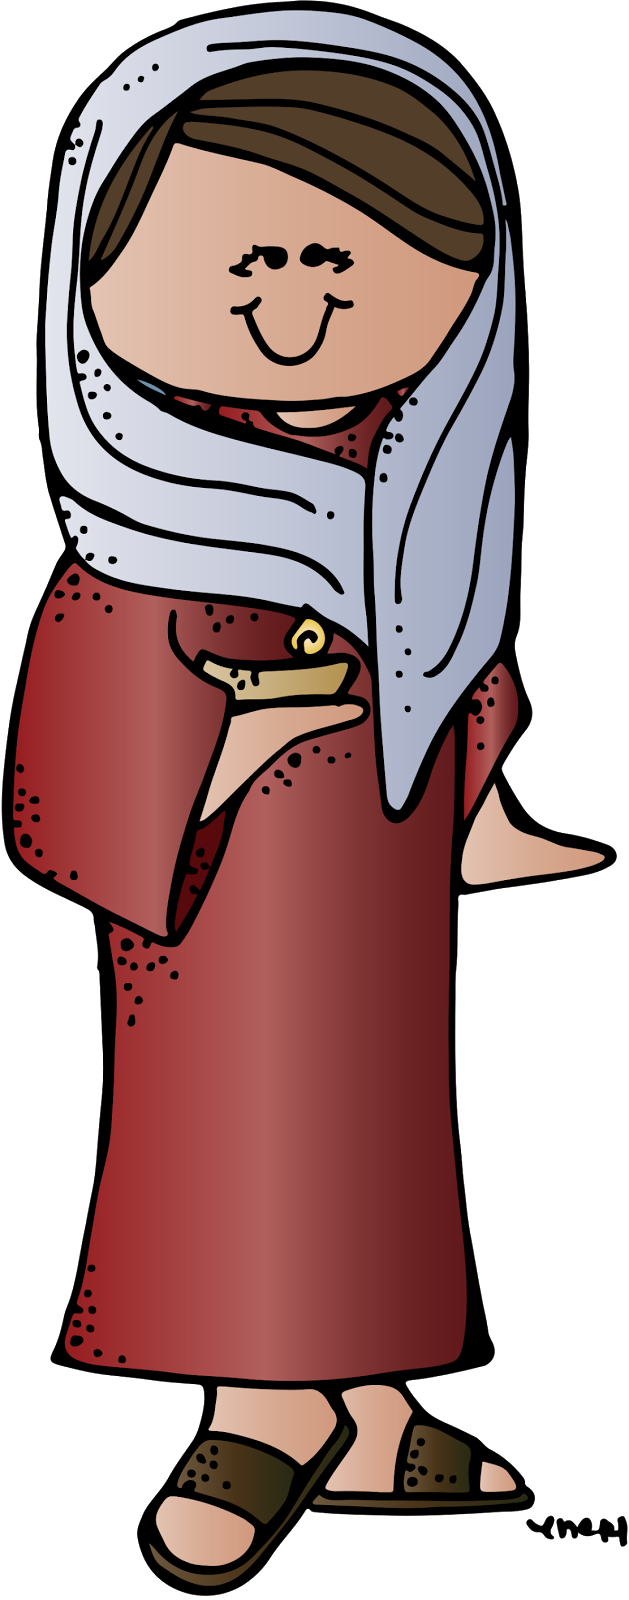 Playdough clipart red. Melonheadz lds illustrating virgin